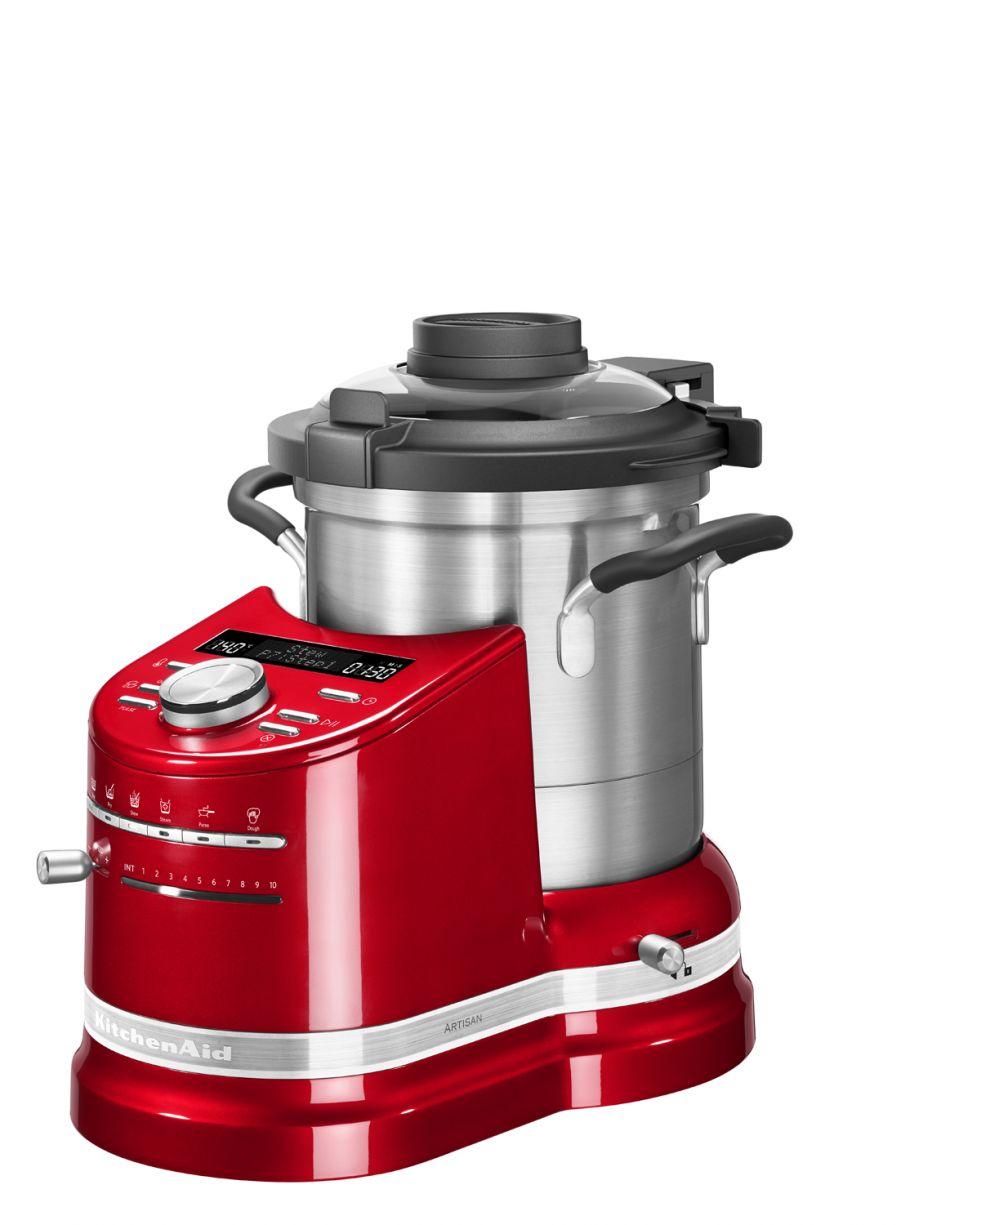 robot cuiseur kitchenaid artisan cook processor rouge. Black Bedroom Furniture Sets. Home Design Ideas